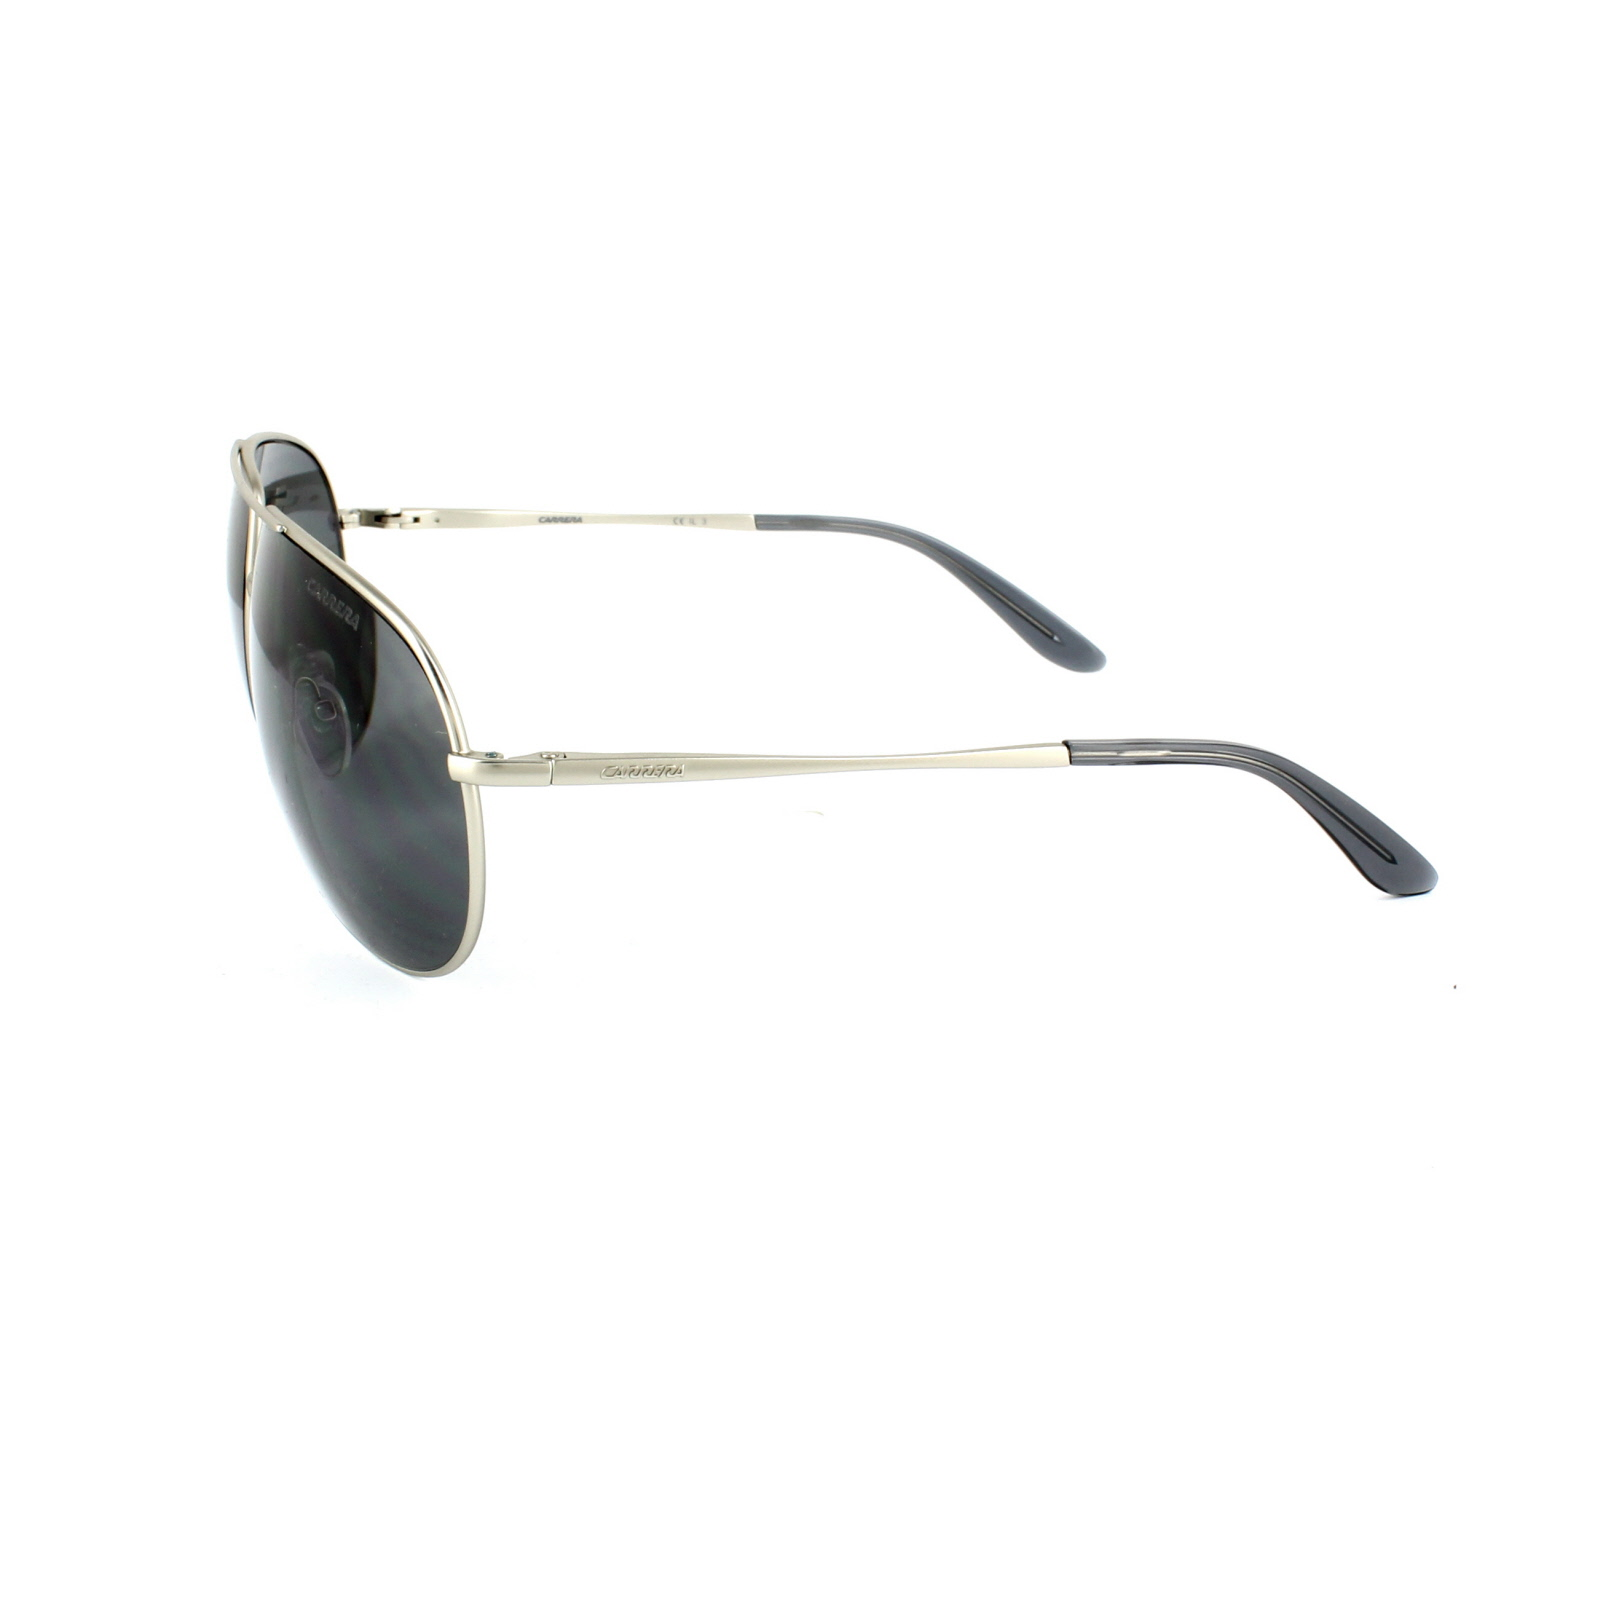 Carrera Sunglasses Gipsy  carrera sunglasses new gipsy 011 p9 matt palladium grey ebay